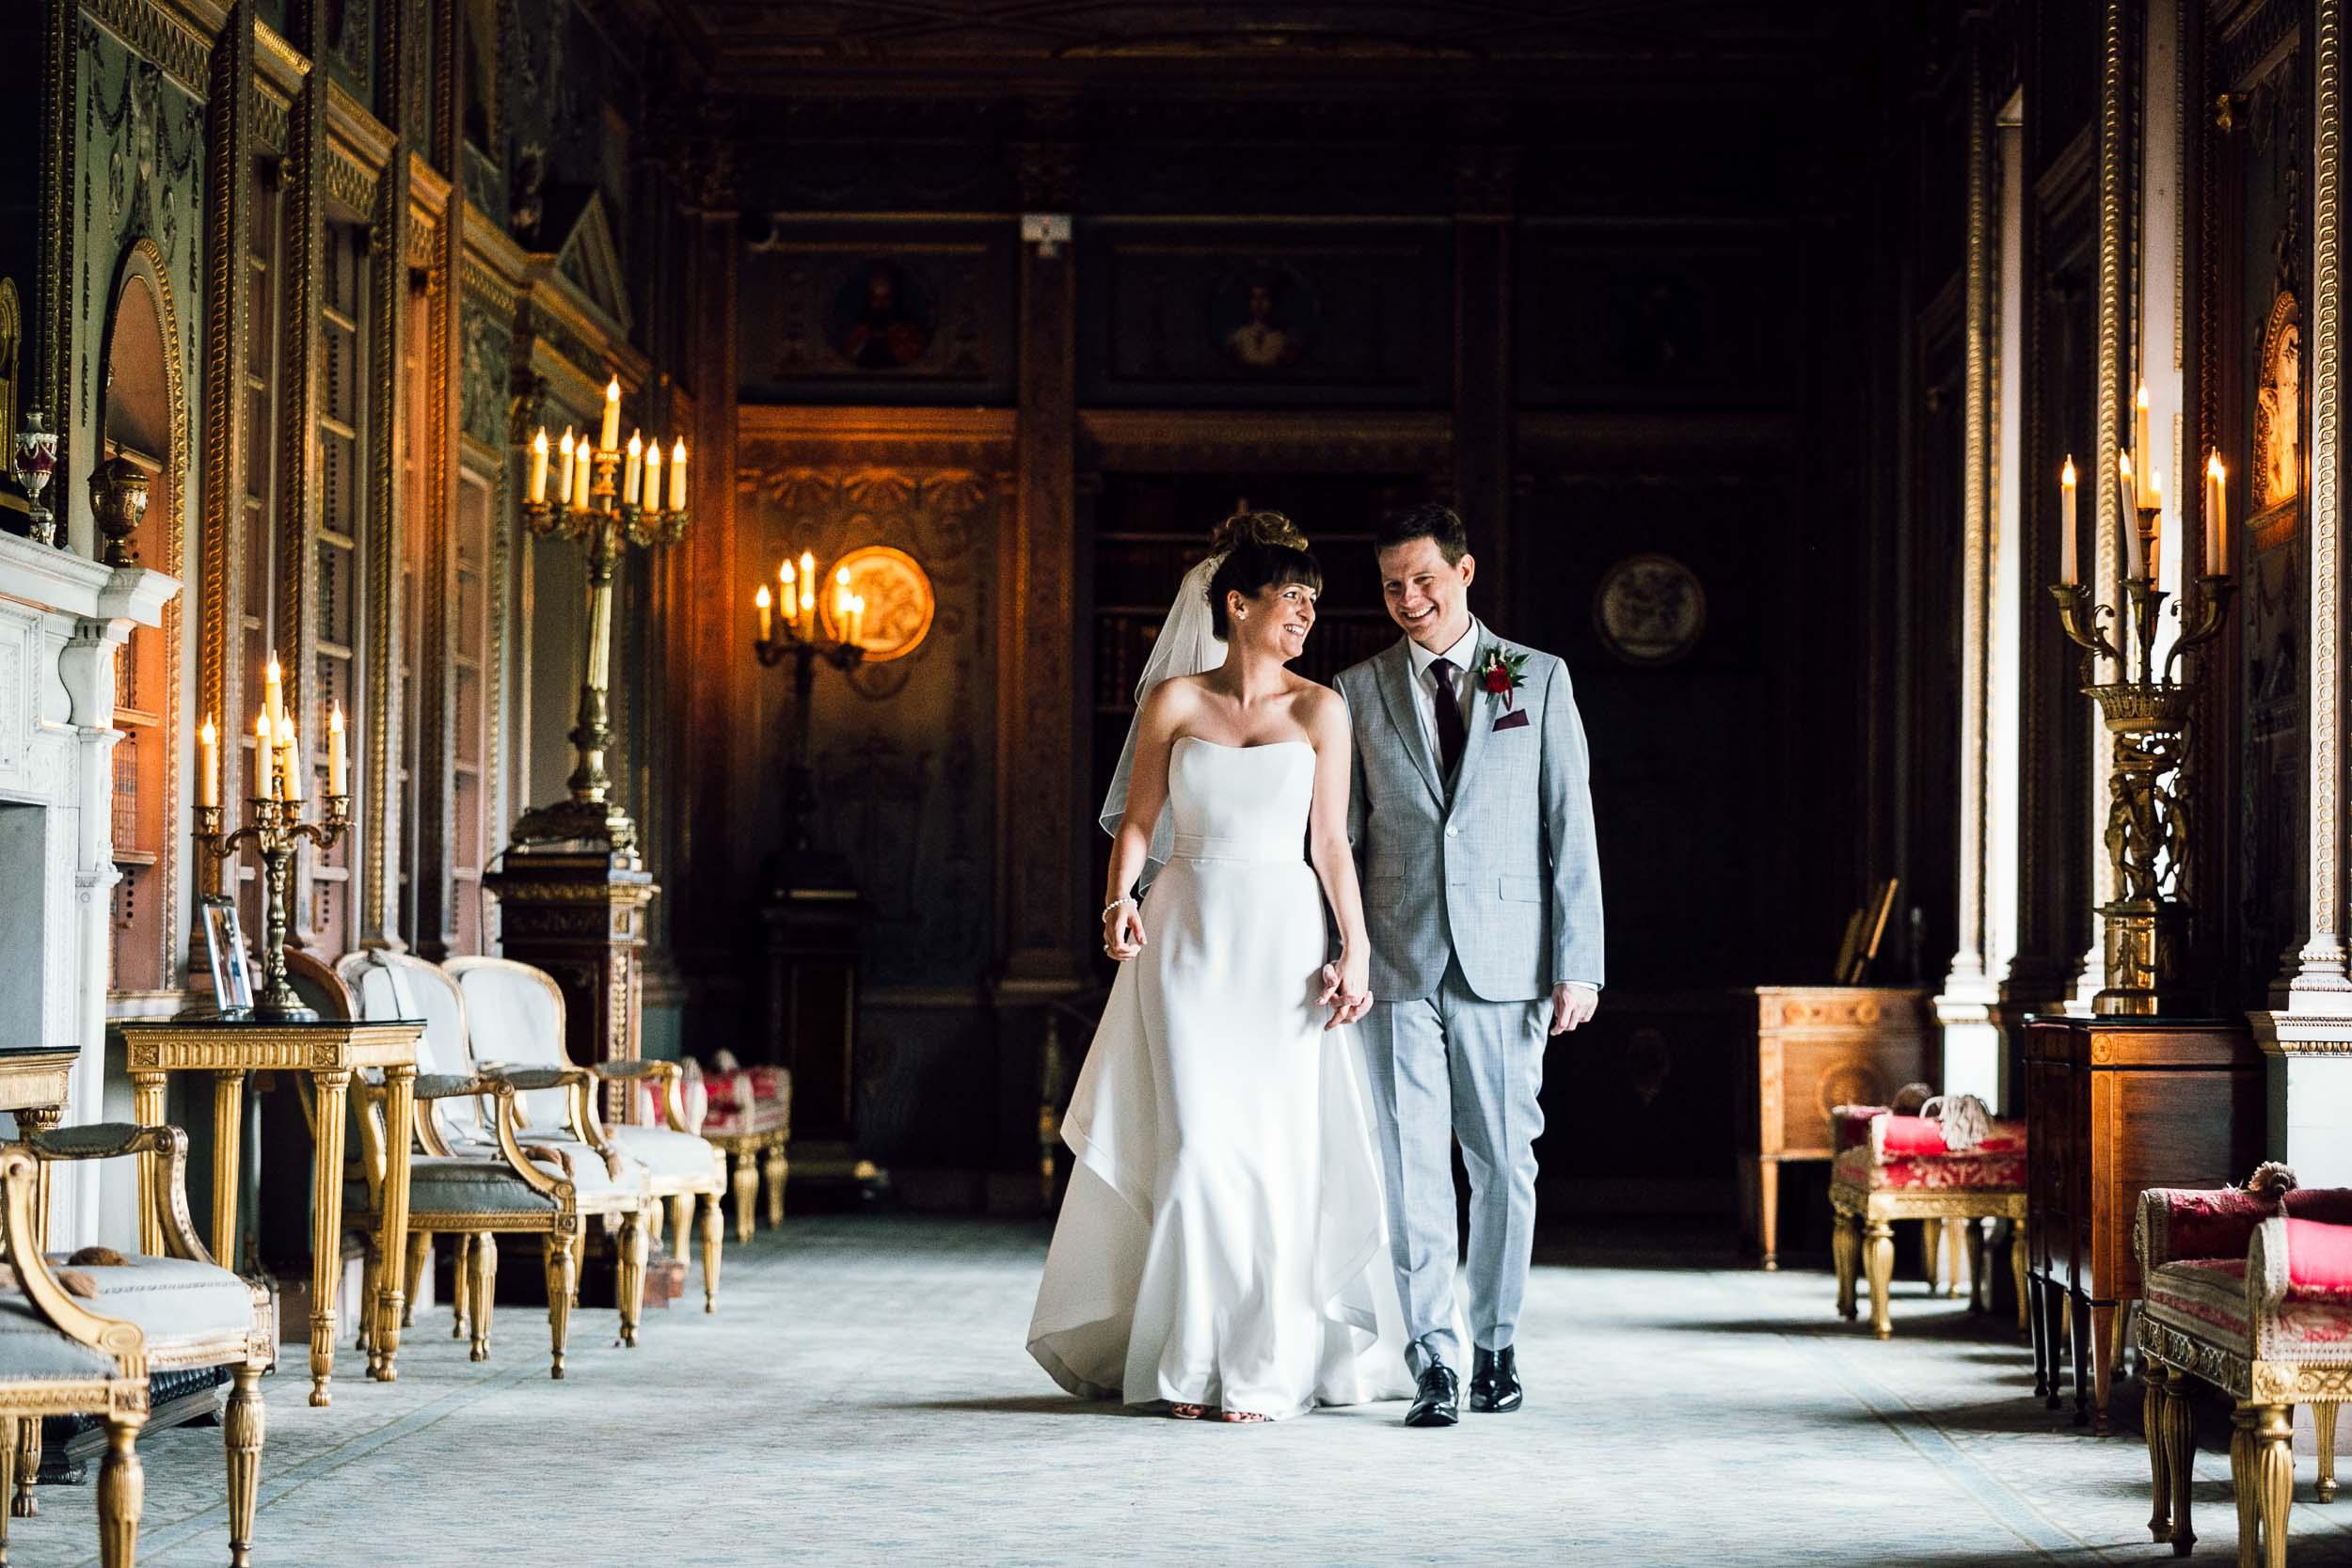 syon-house-wedding-photographer-london 080.jpg